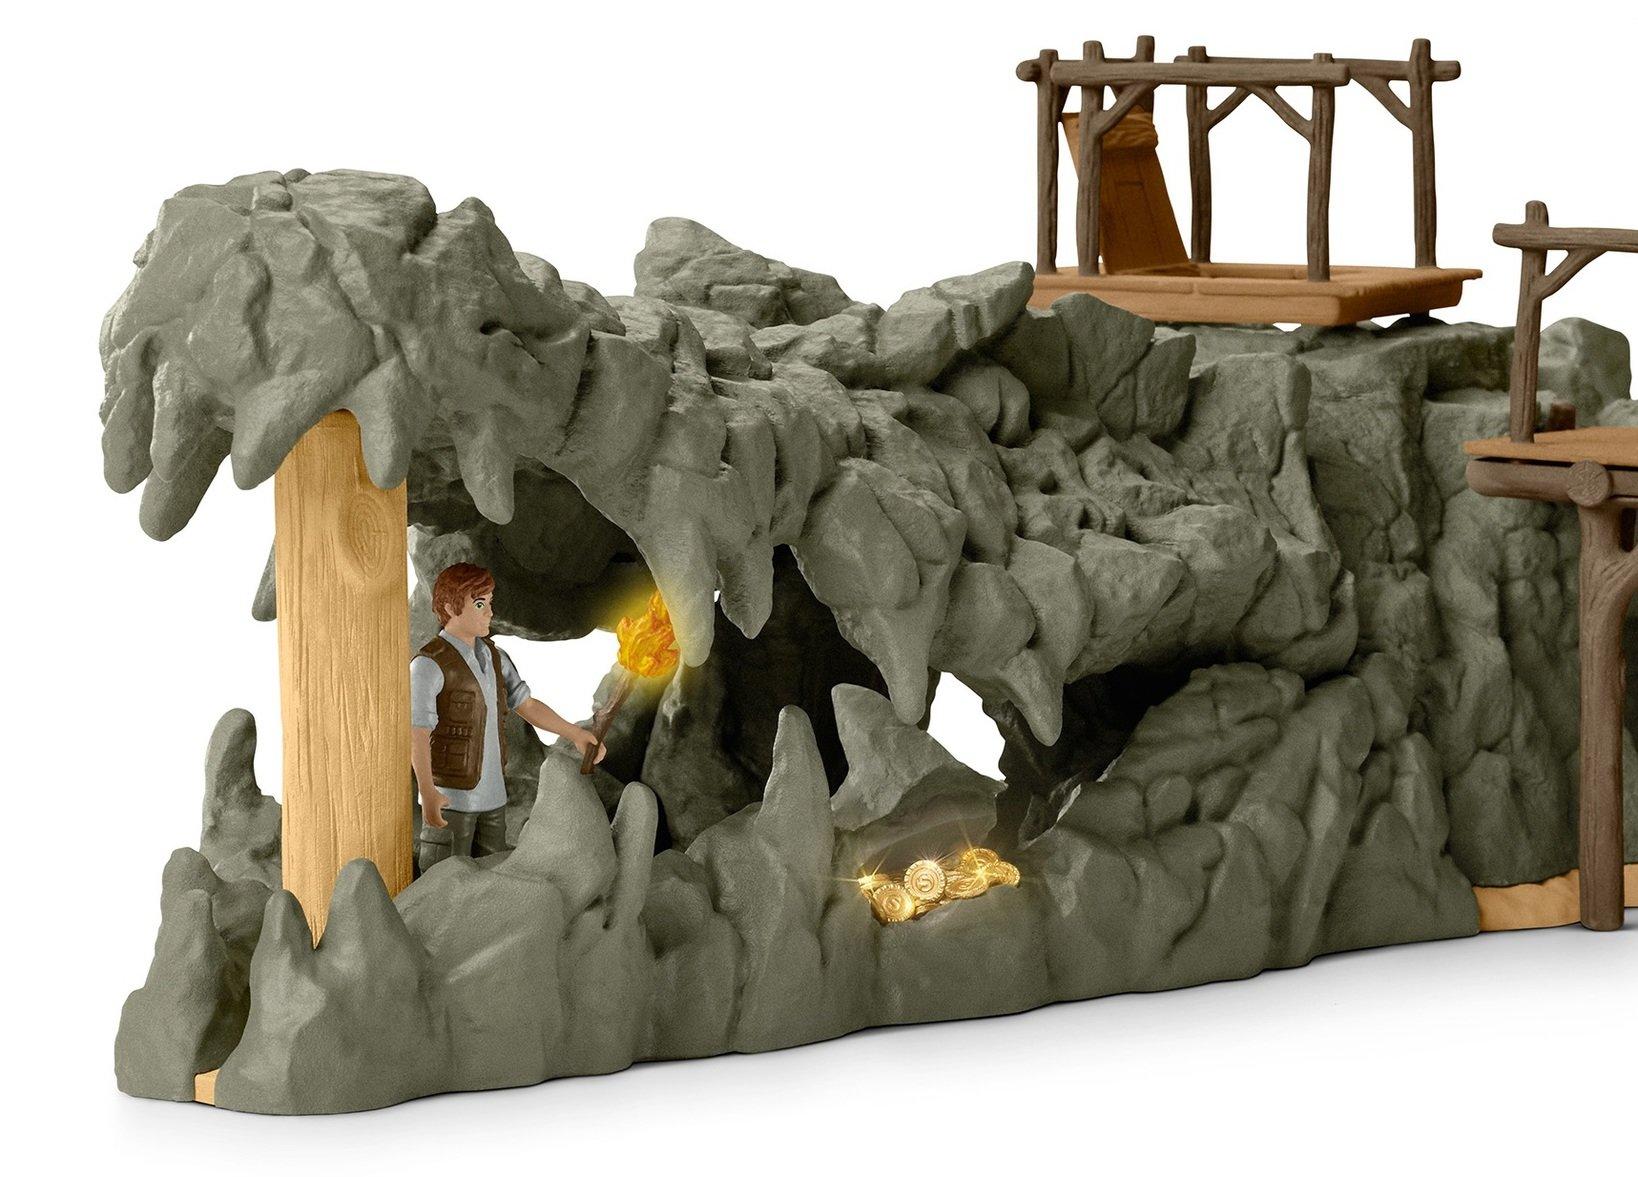 CROCOは開閉できます。口の中は洞窟になっていて、秘密の隠し場所として遊べます。